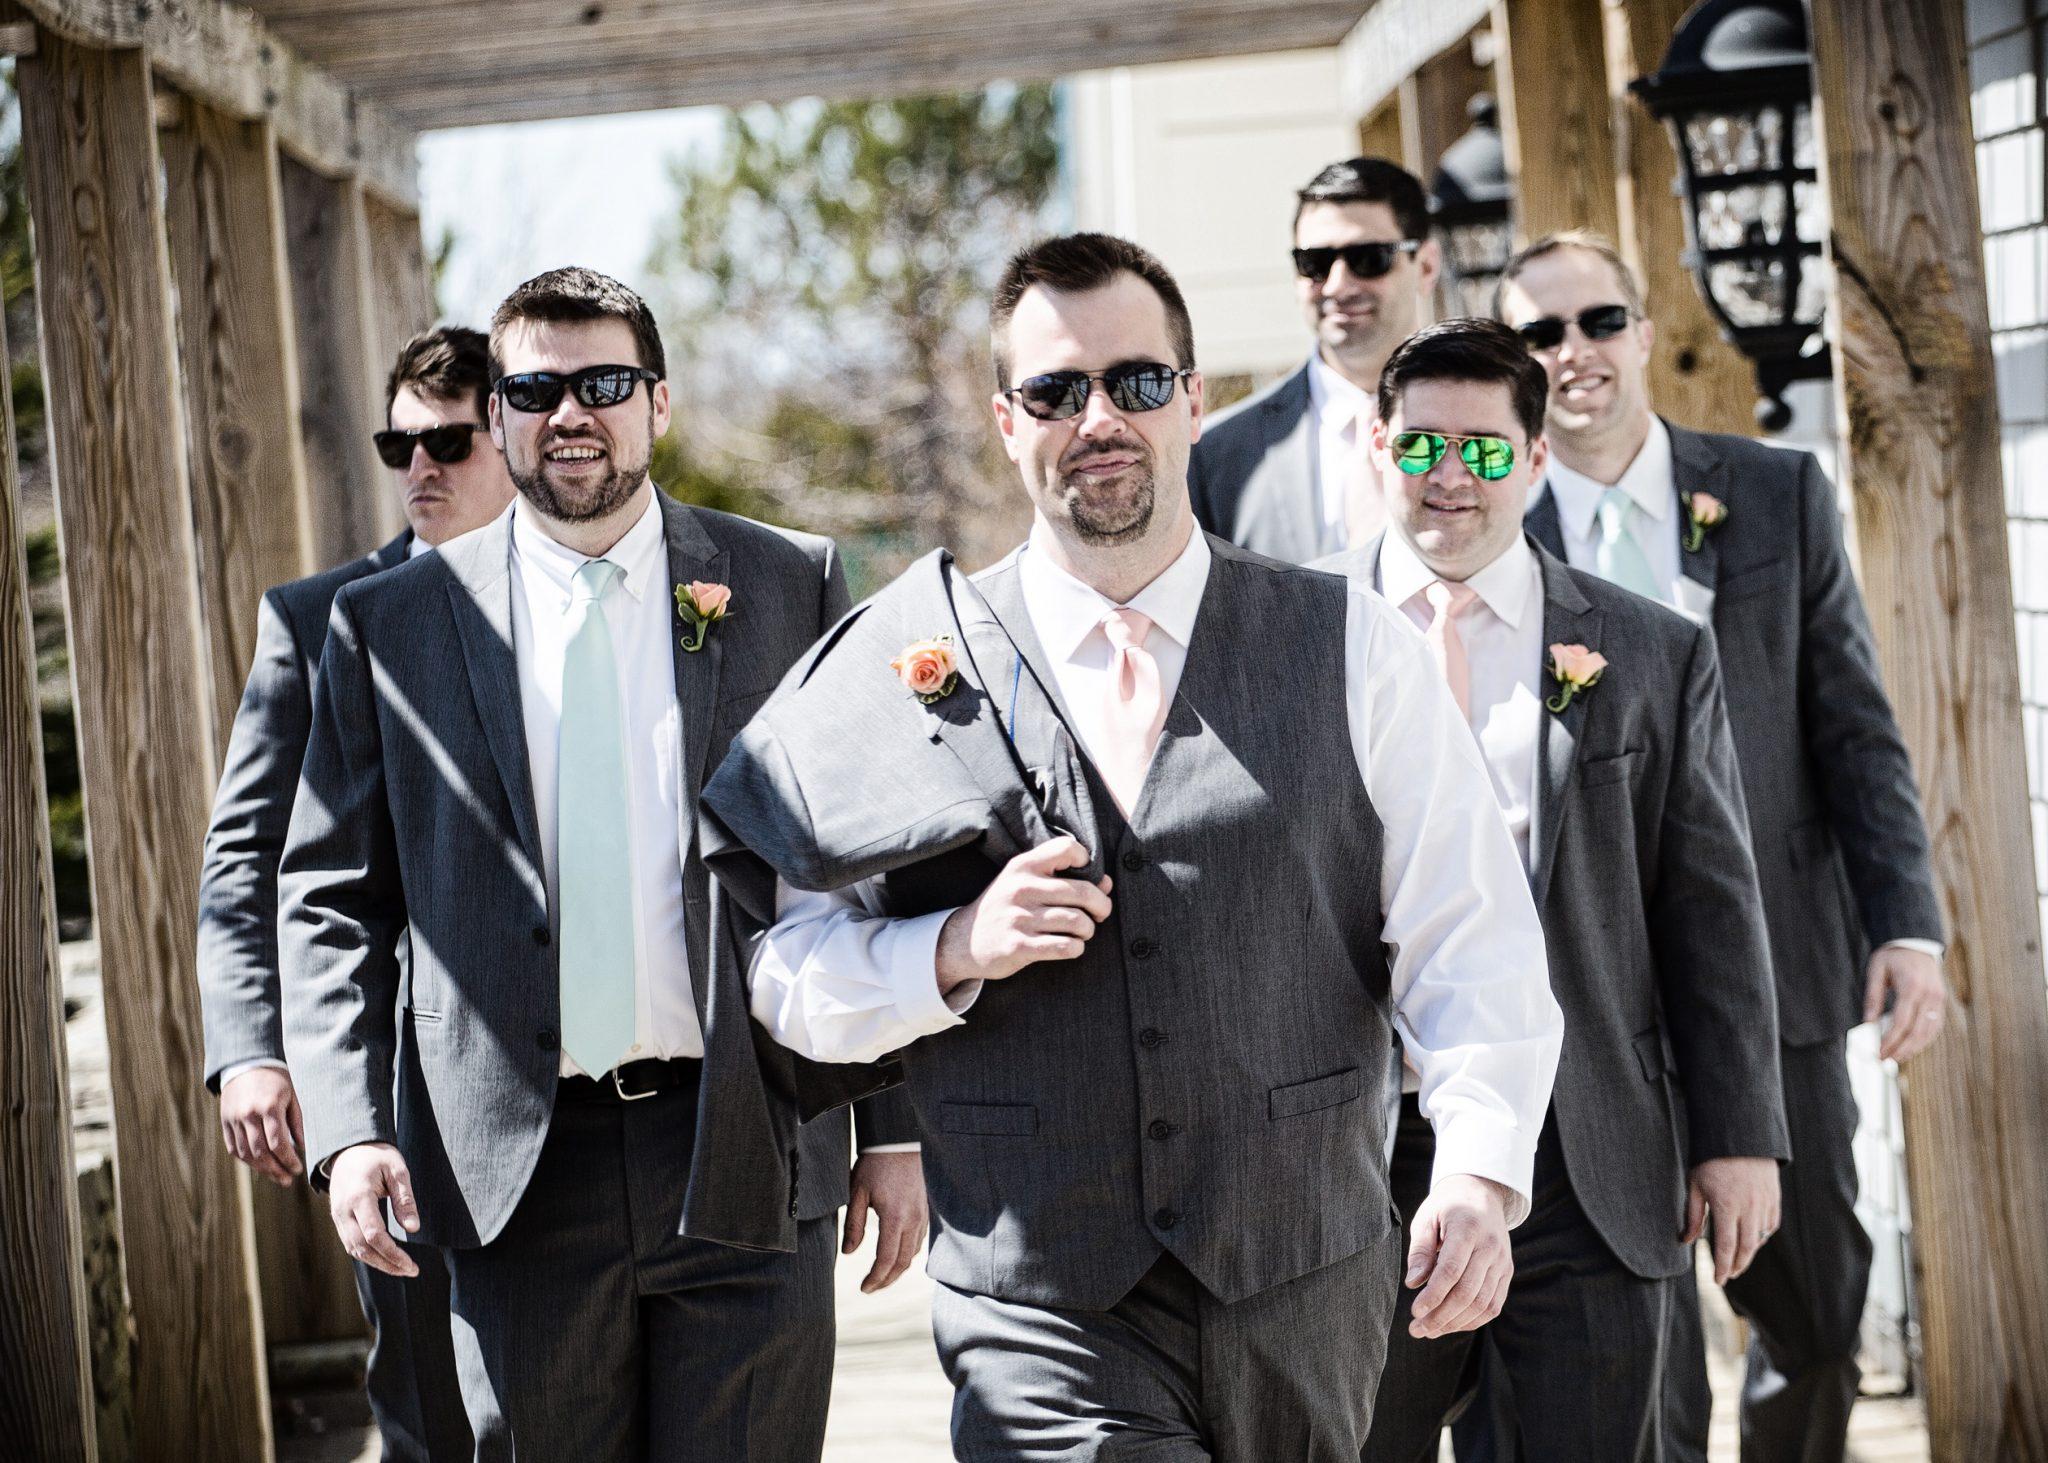 Groom and groomsmen at Samoset Resort wedding in Rockland, Maine